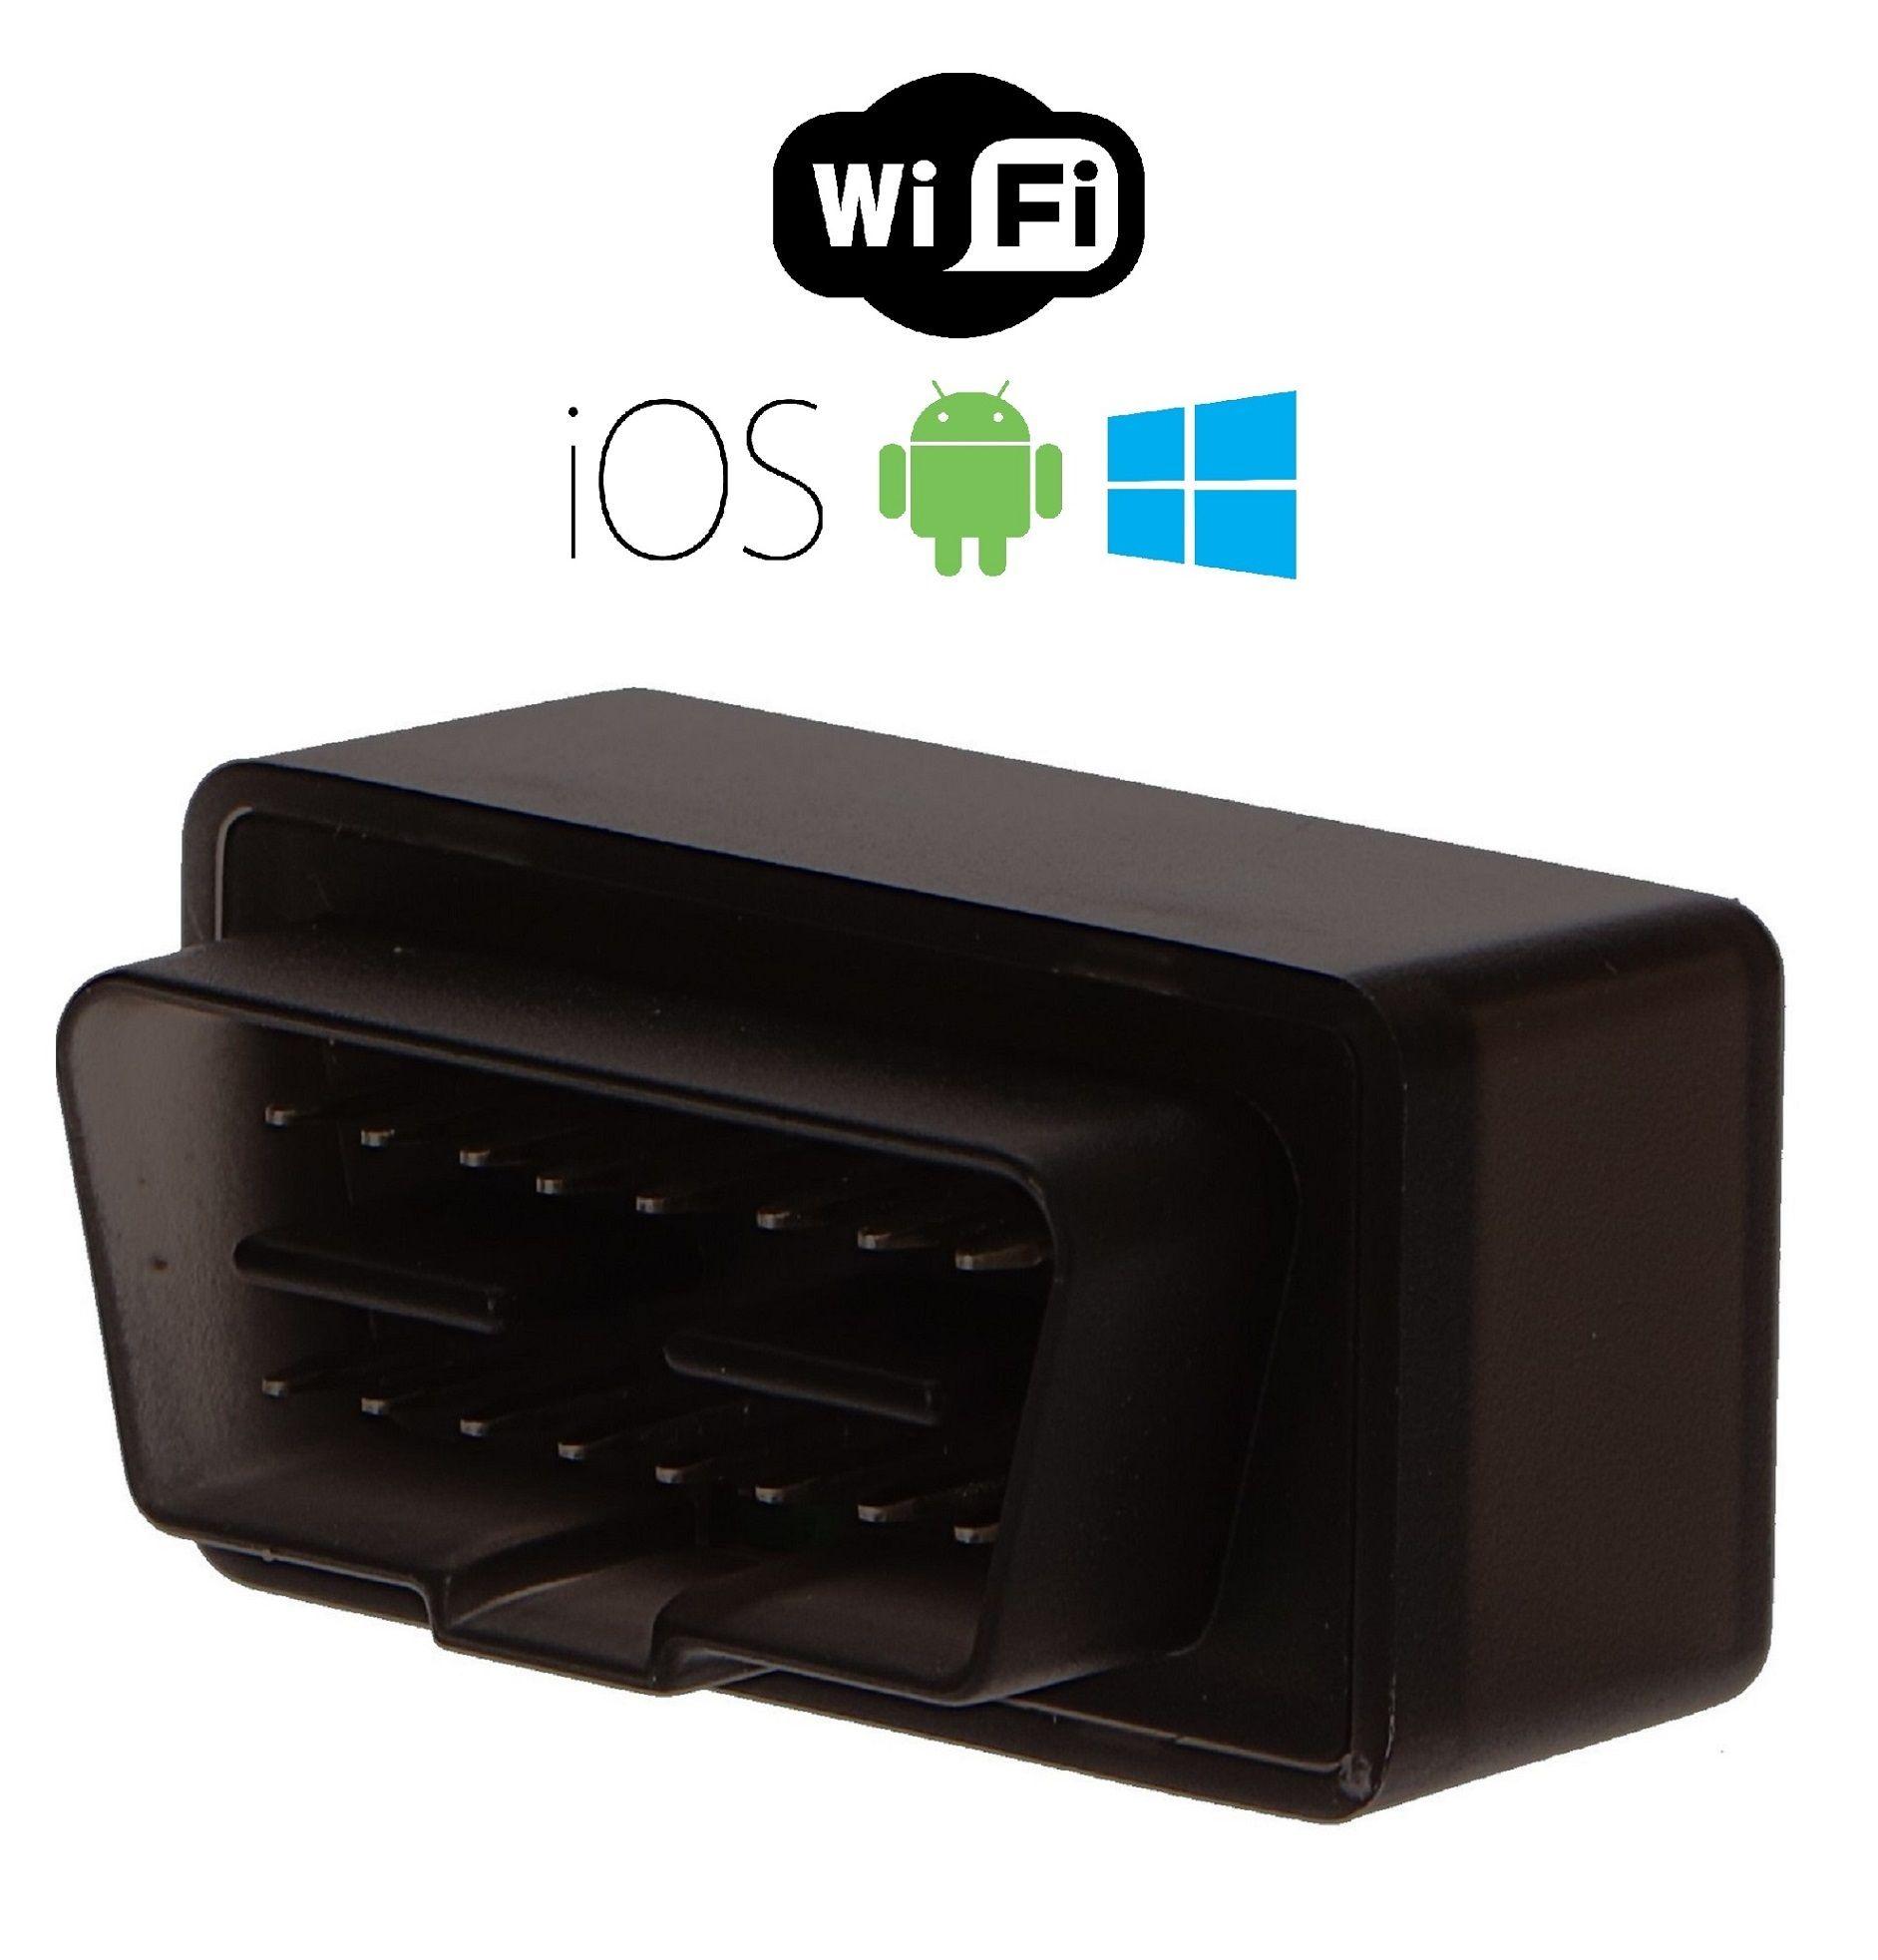 Autodiagnostika SX1 WiFi černá, IOS, Android (zdarma SX OBD aplikace)